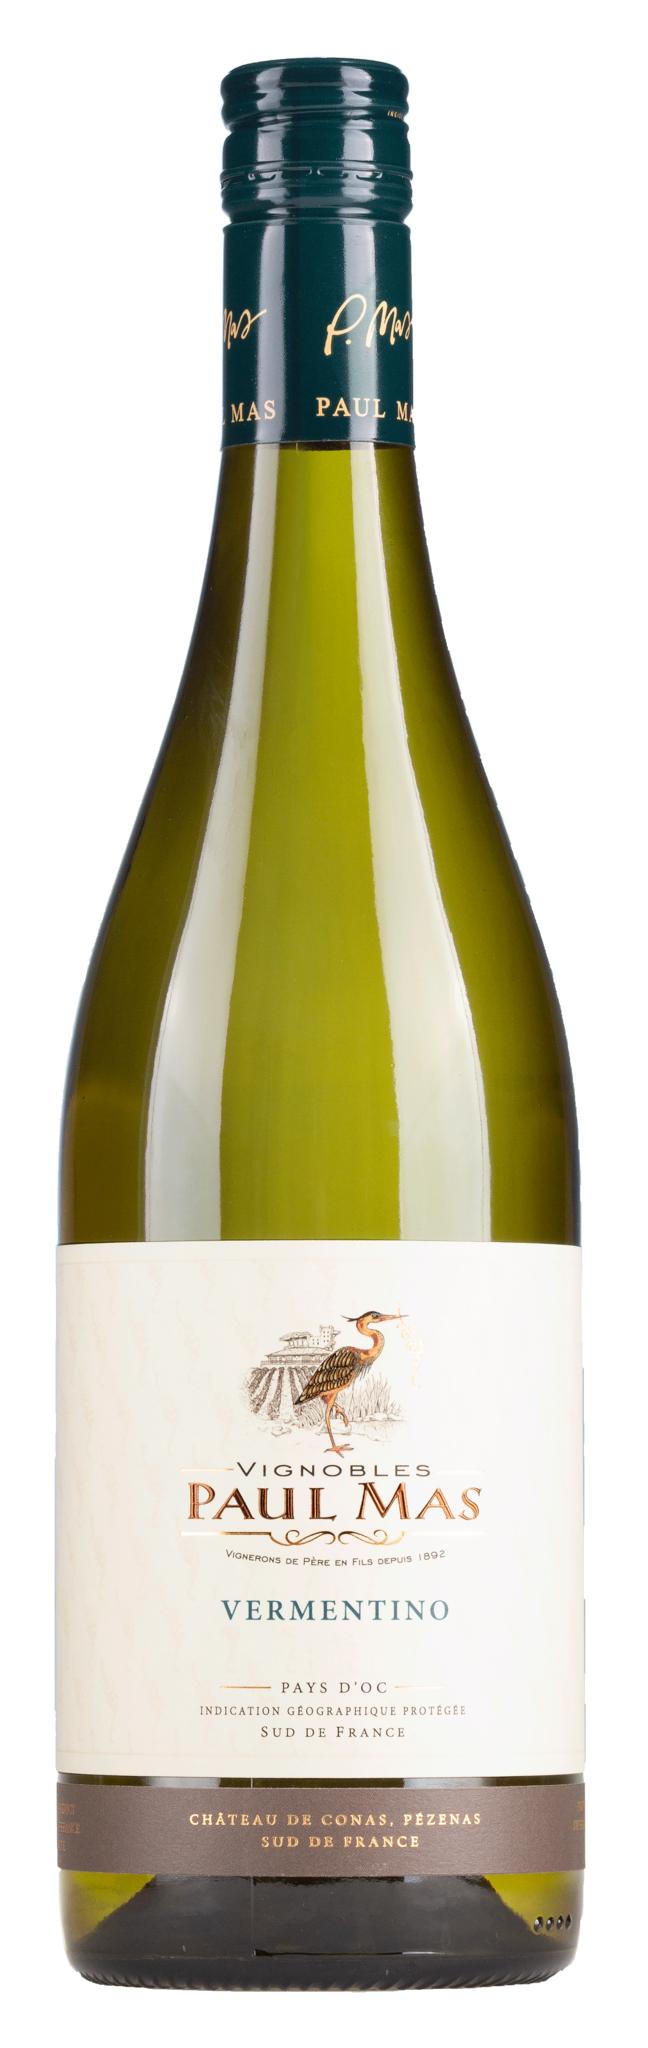 Mas, Paul - Languedoc 2020 Vermentino Classique IGP, Vignobles Paul Mas